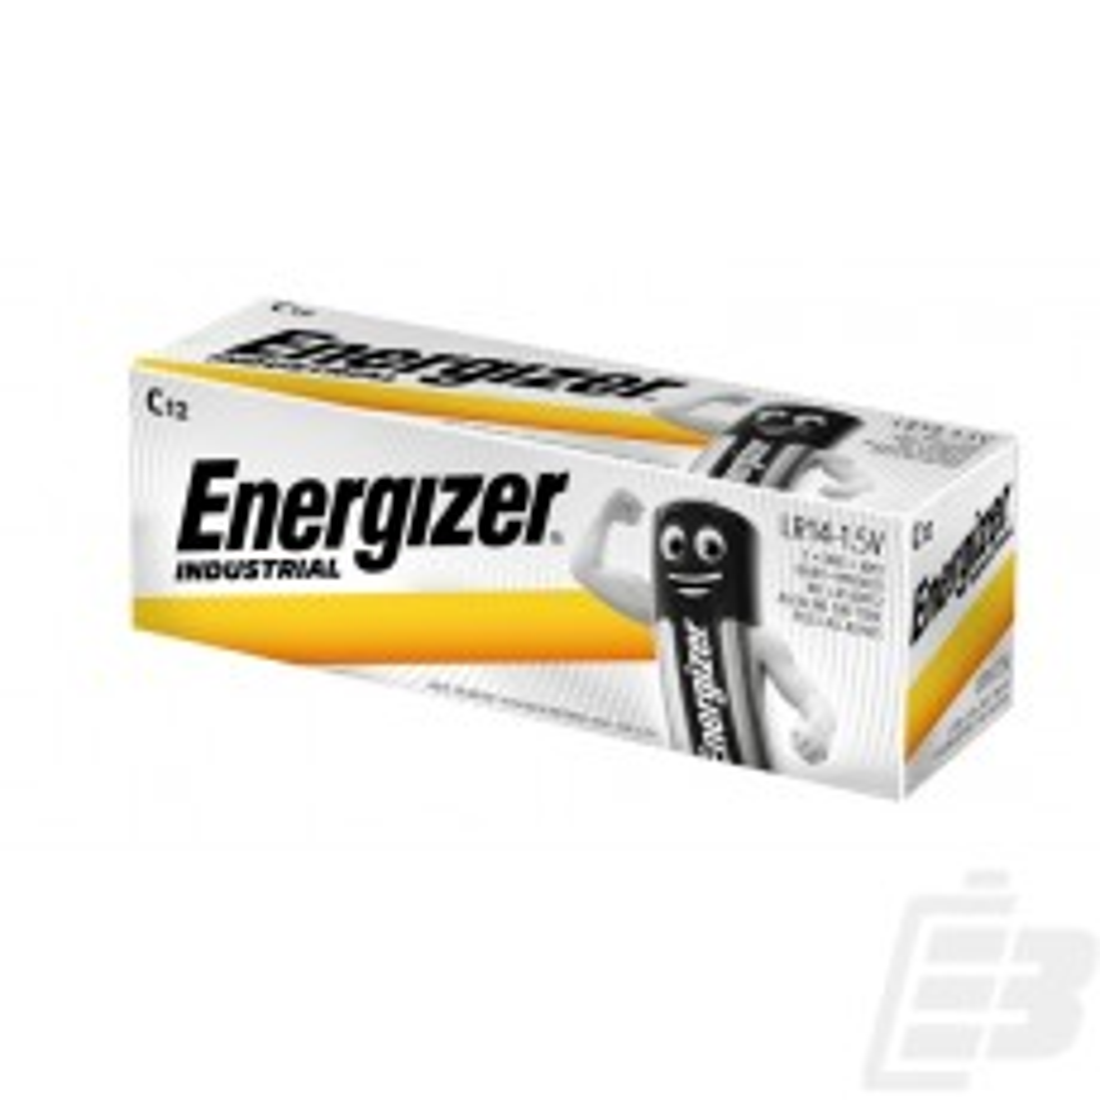 Energizer Industrial C LR14 battery